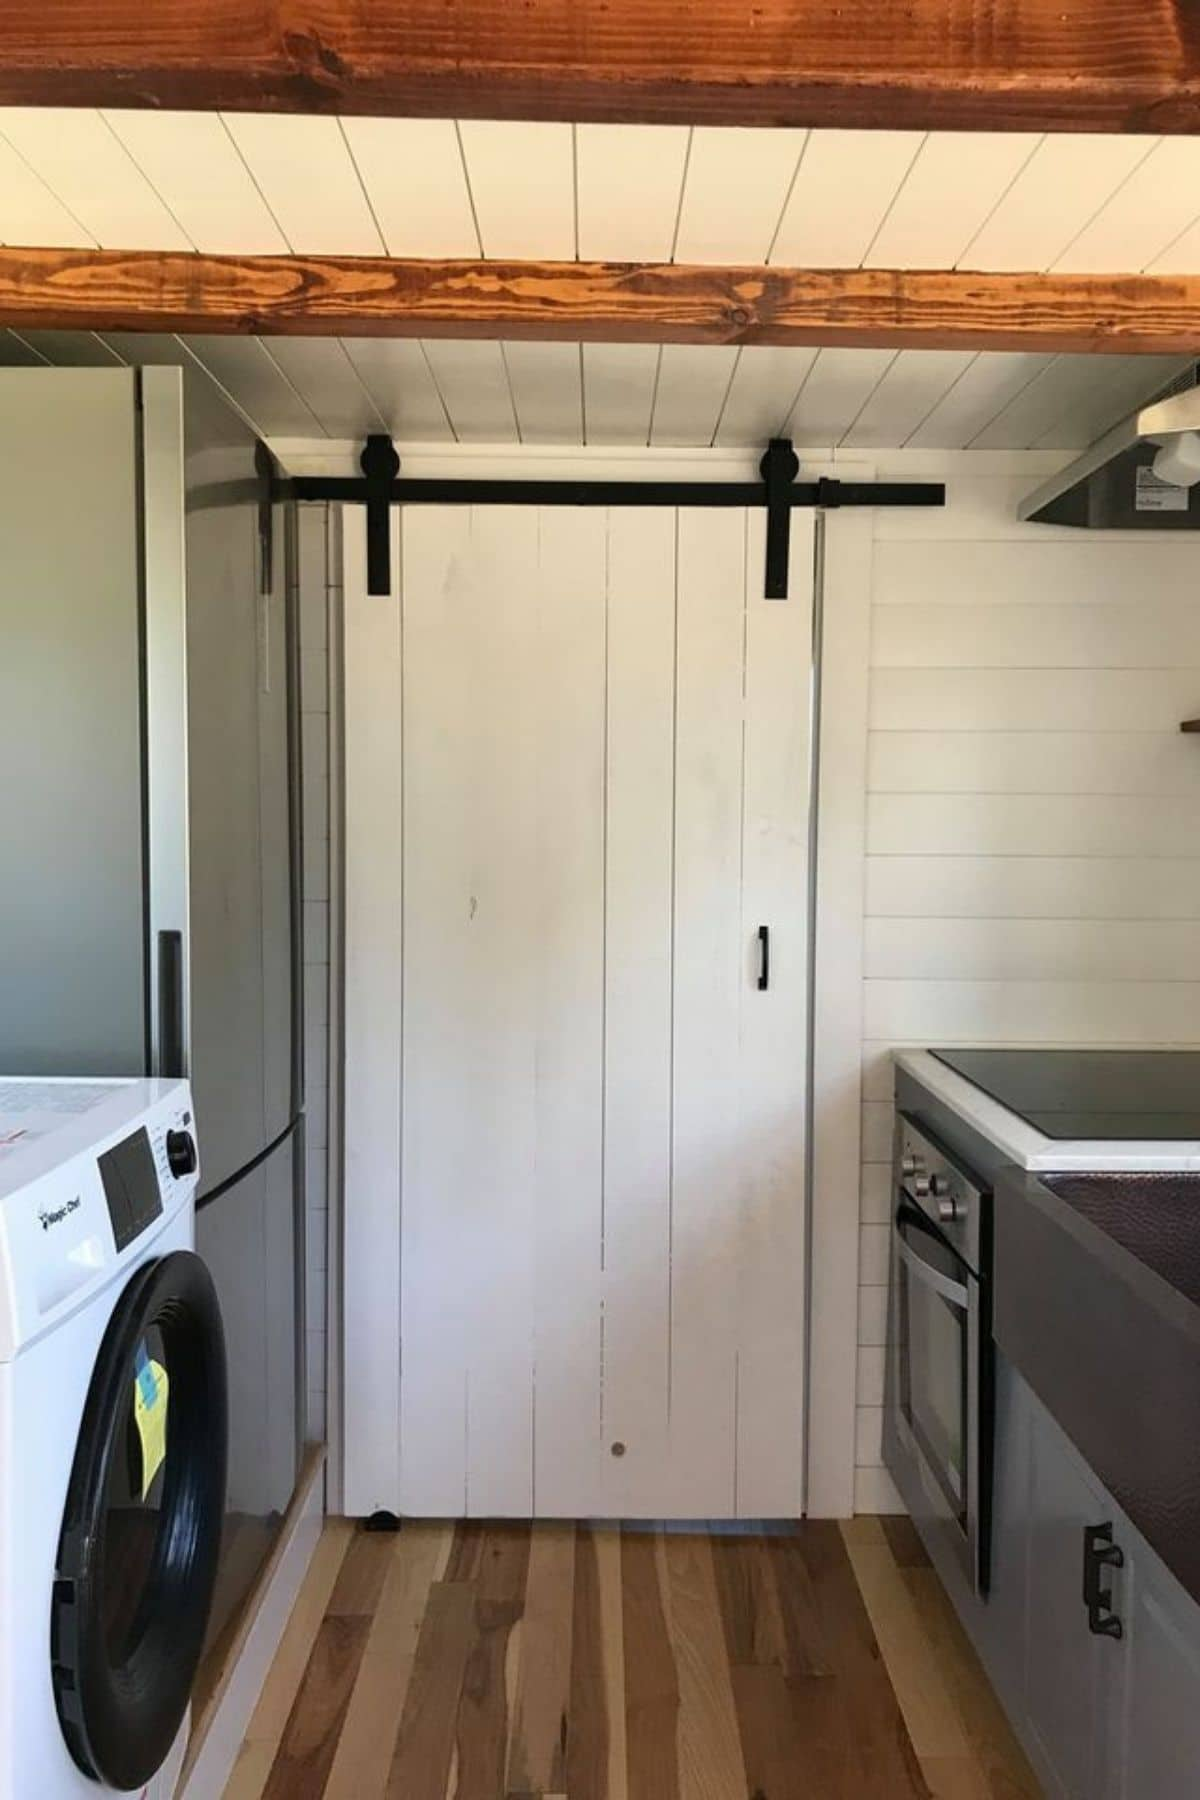 White barnhouse door against back of kitchen wall